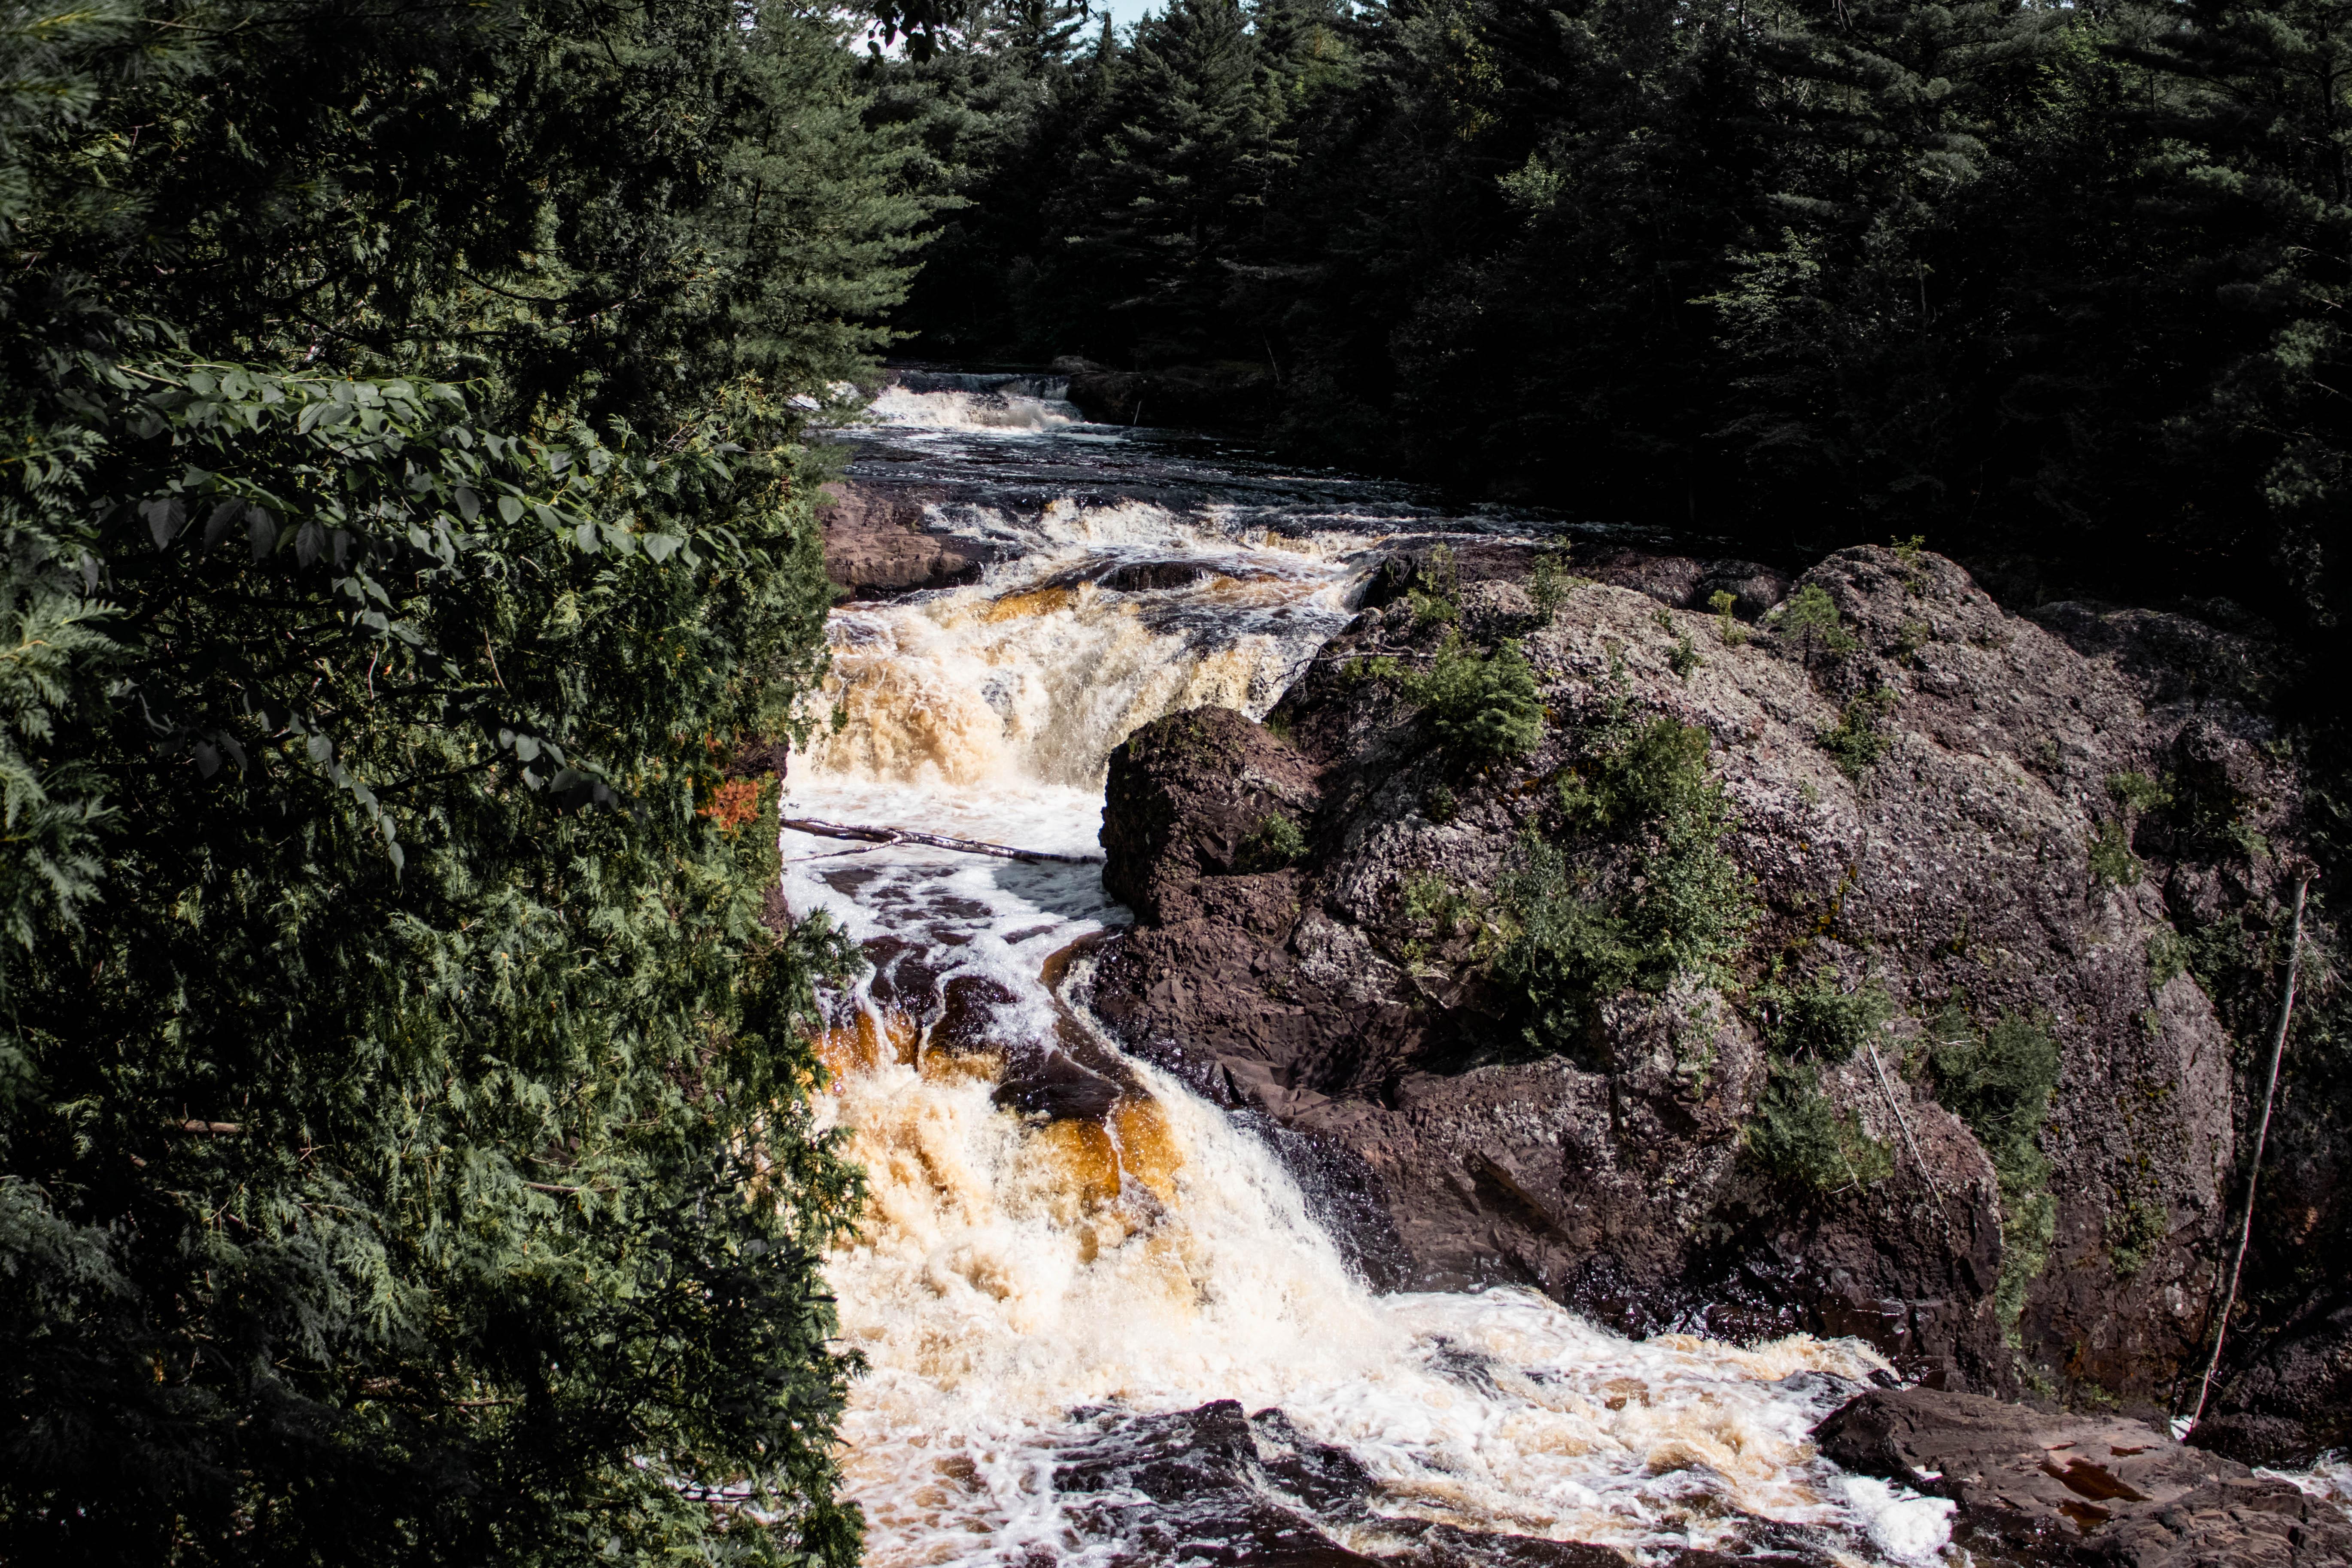 Potato River Falls   Gurney, Wisconsin   Waterfalls in Wisconsin   Indigo Sahara   Travel & Lifestyle Blog